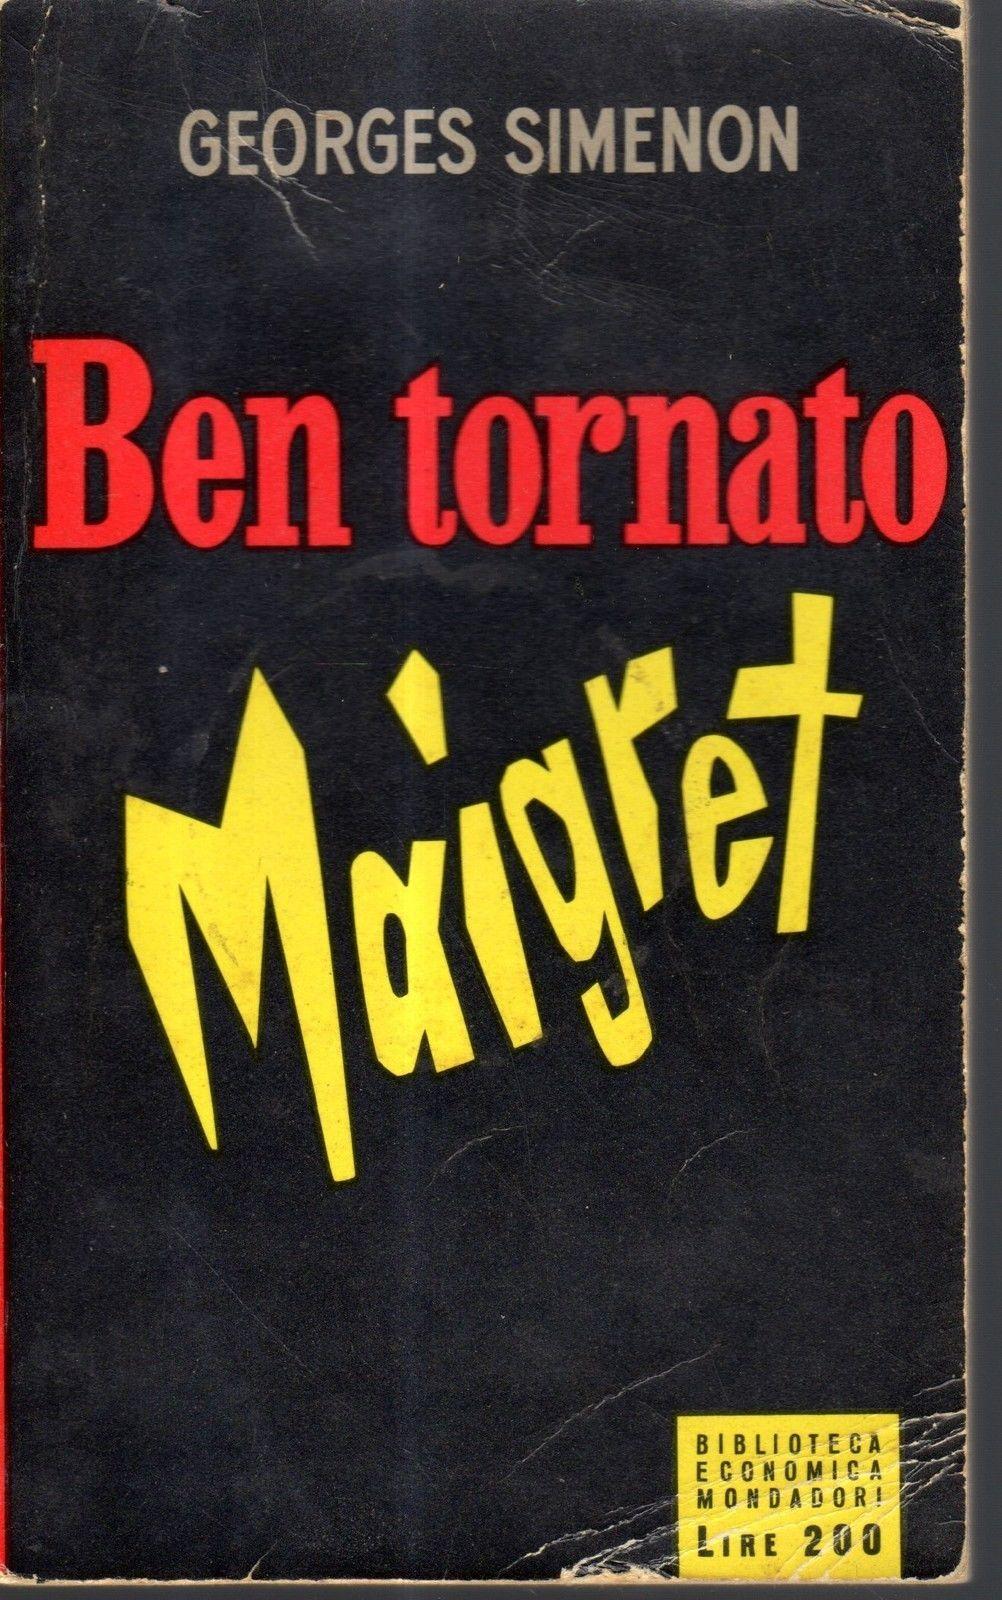 Ben tornato, Maigret (Maigret et son mort) – Prima edizione italiana